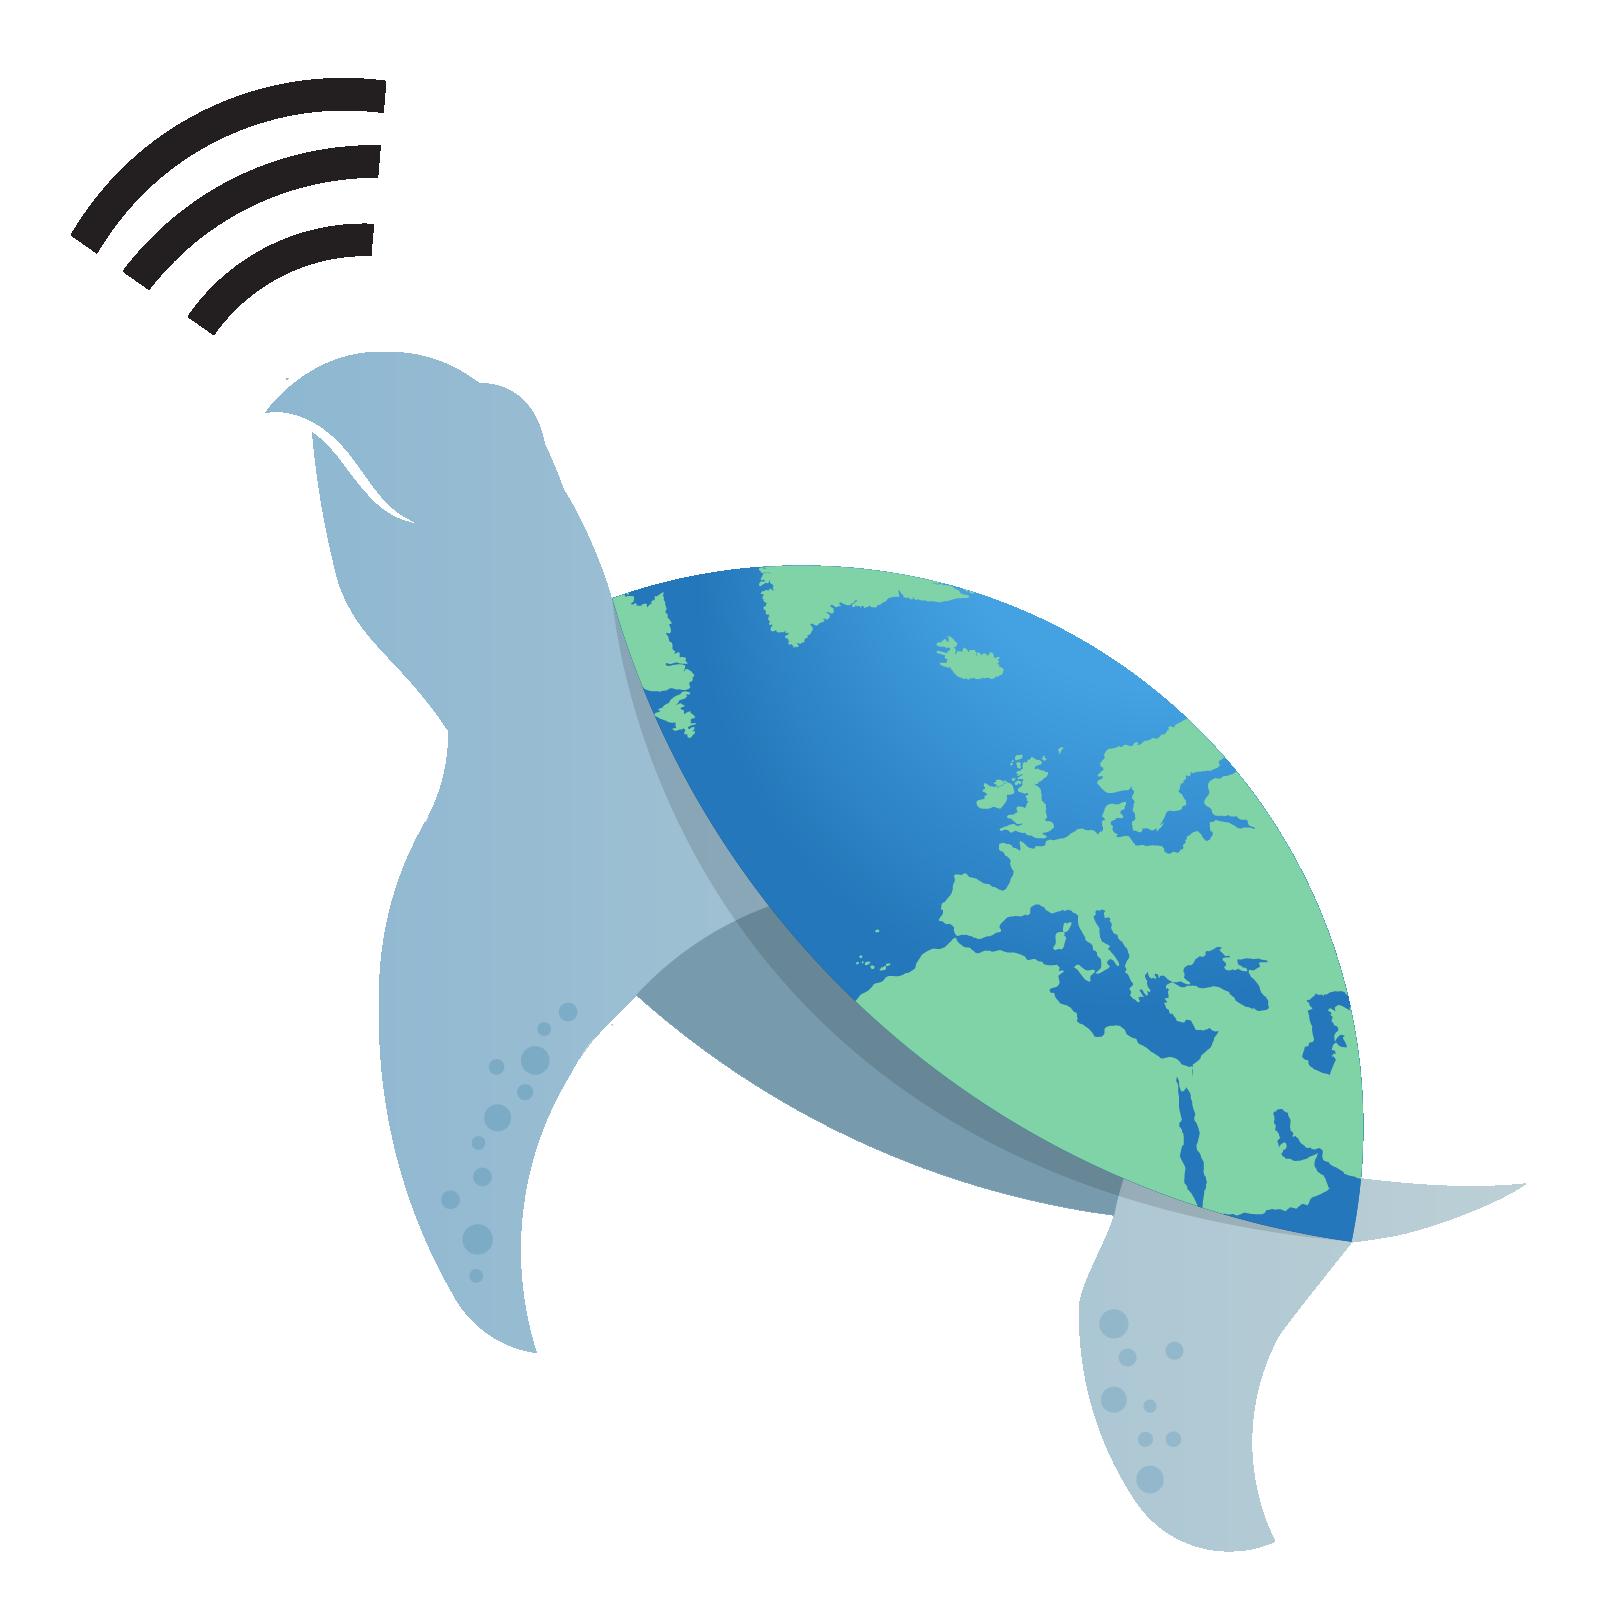 the digital nomad world